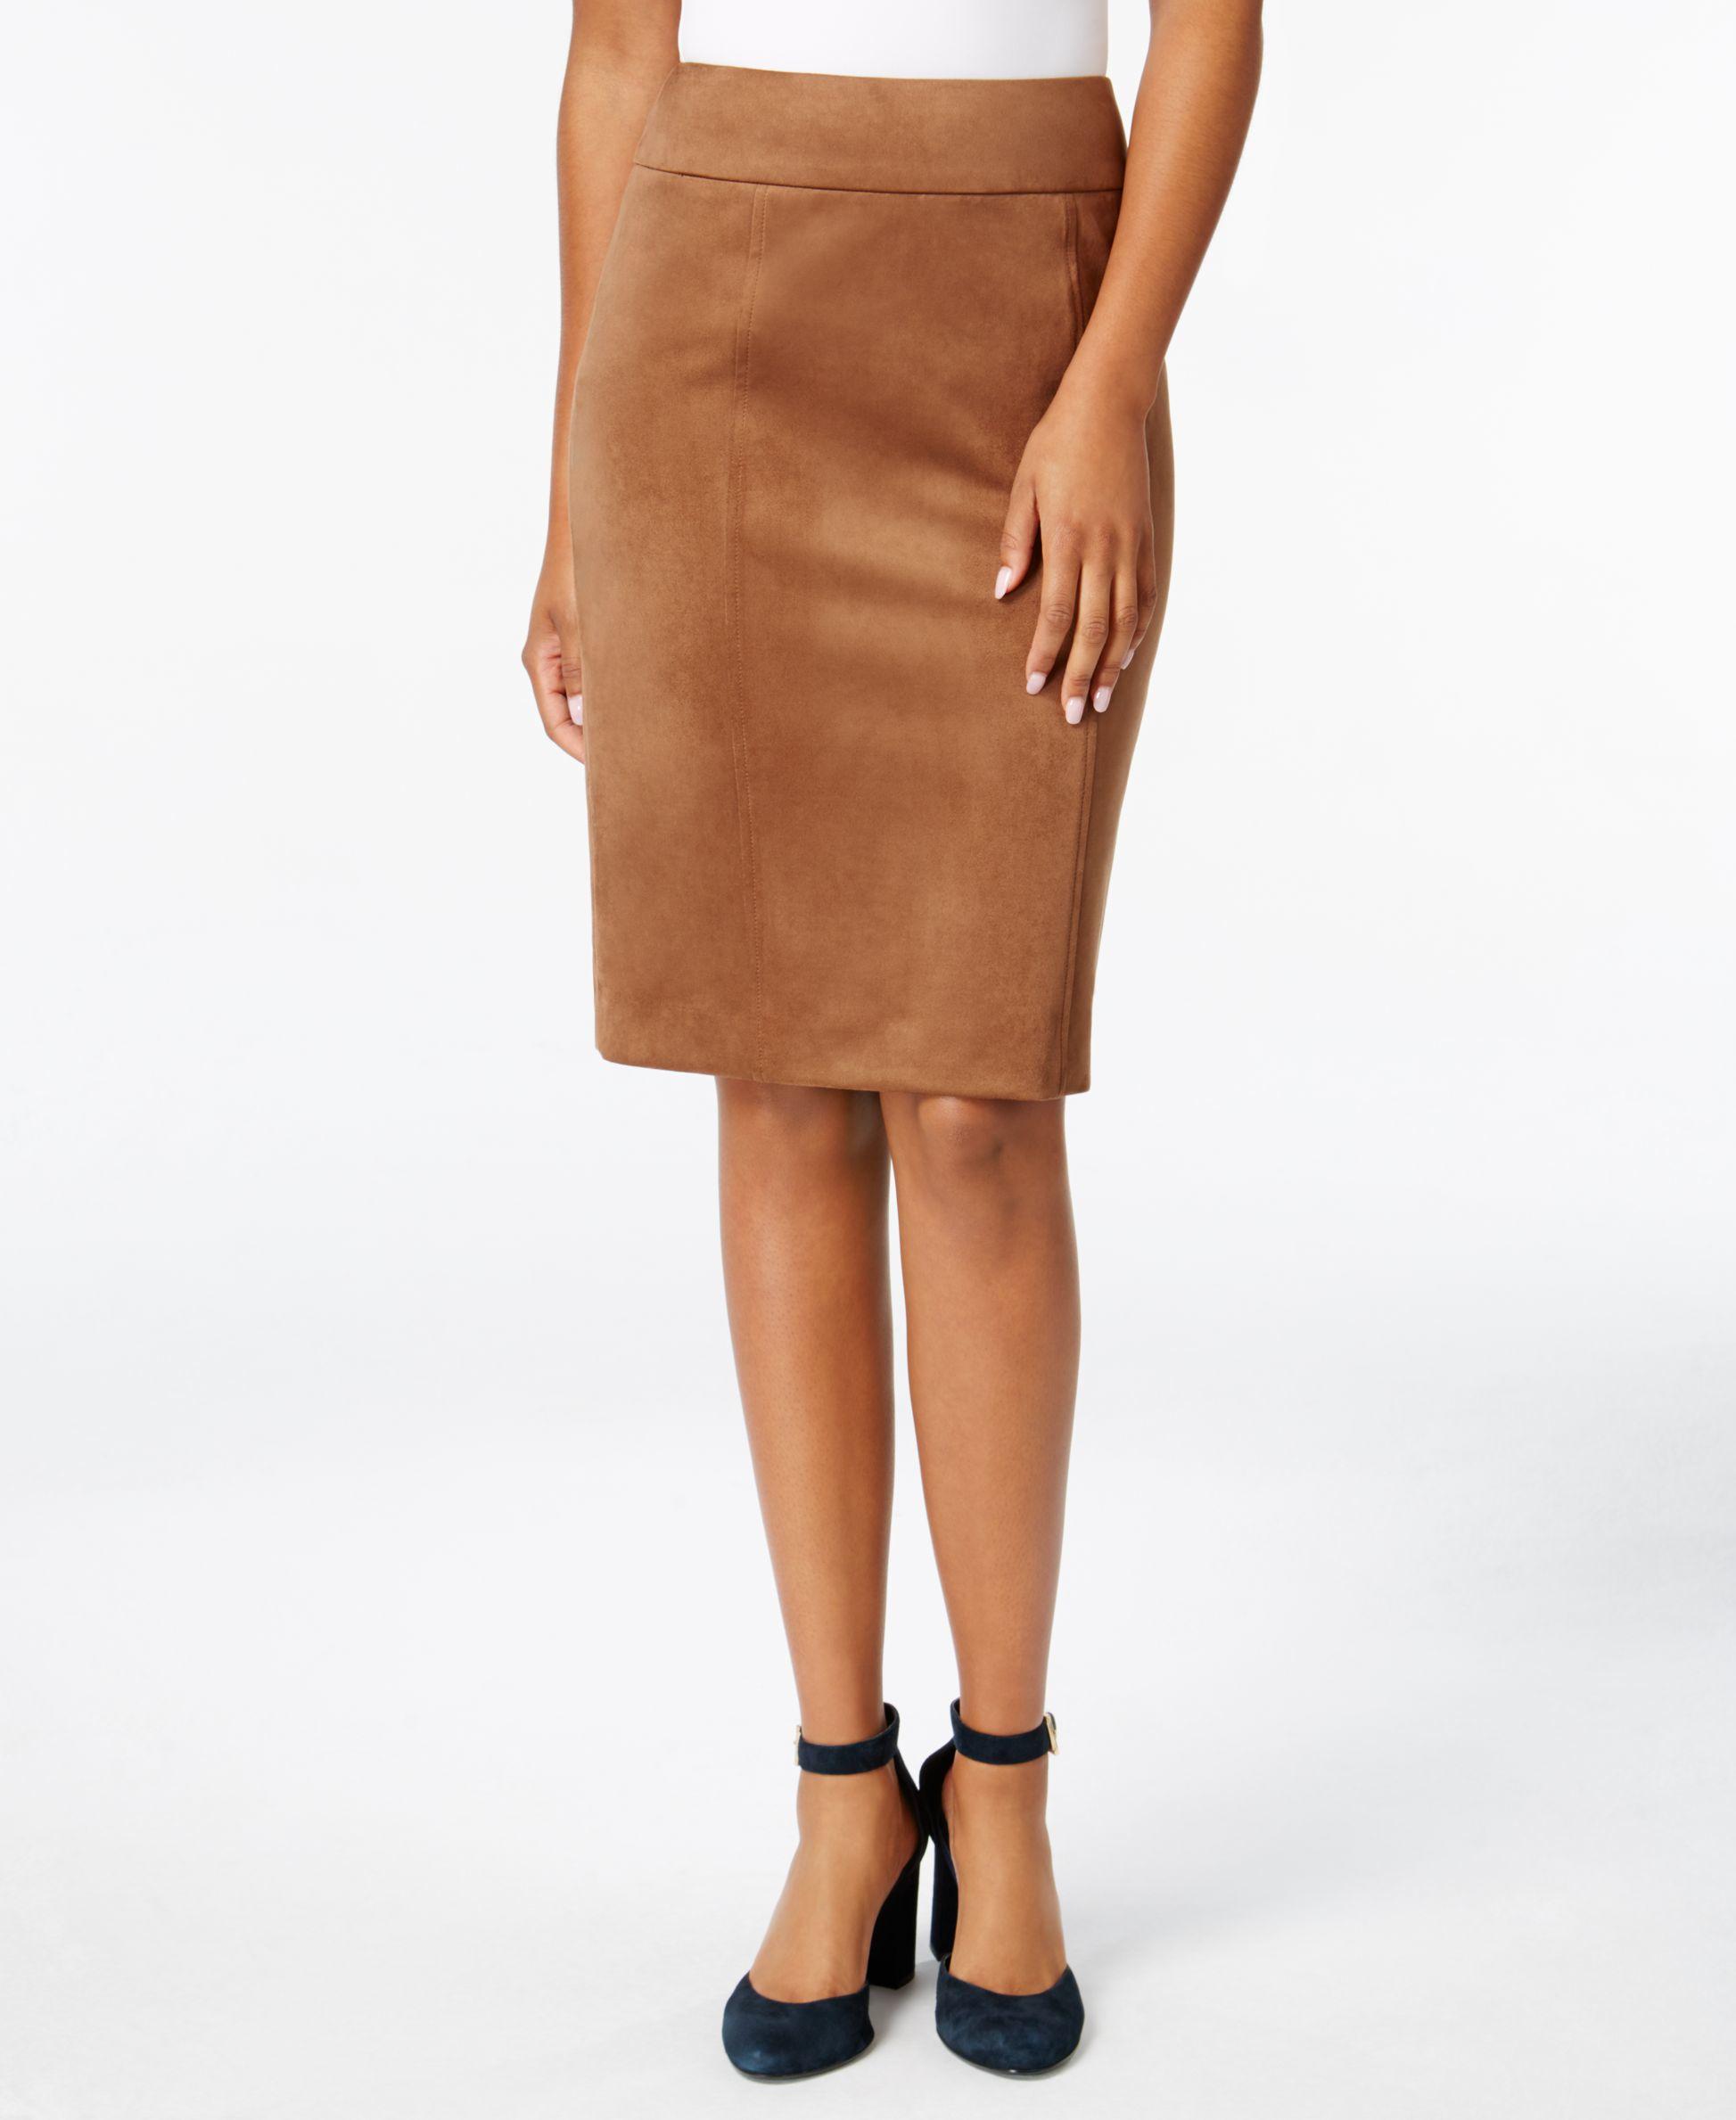 eddbcc86c4 Tommy Hilfiger Faux-suede Pencil Skirt in Brown - Lyst